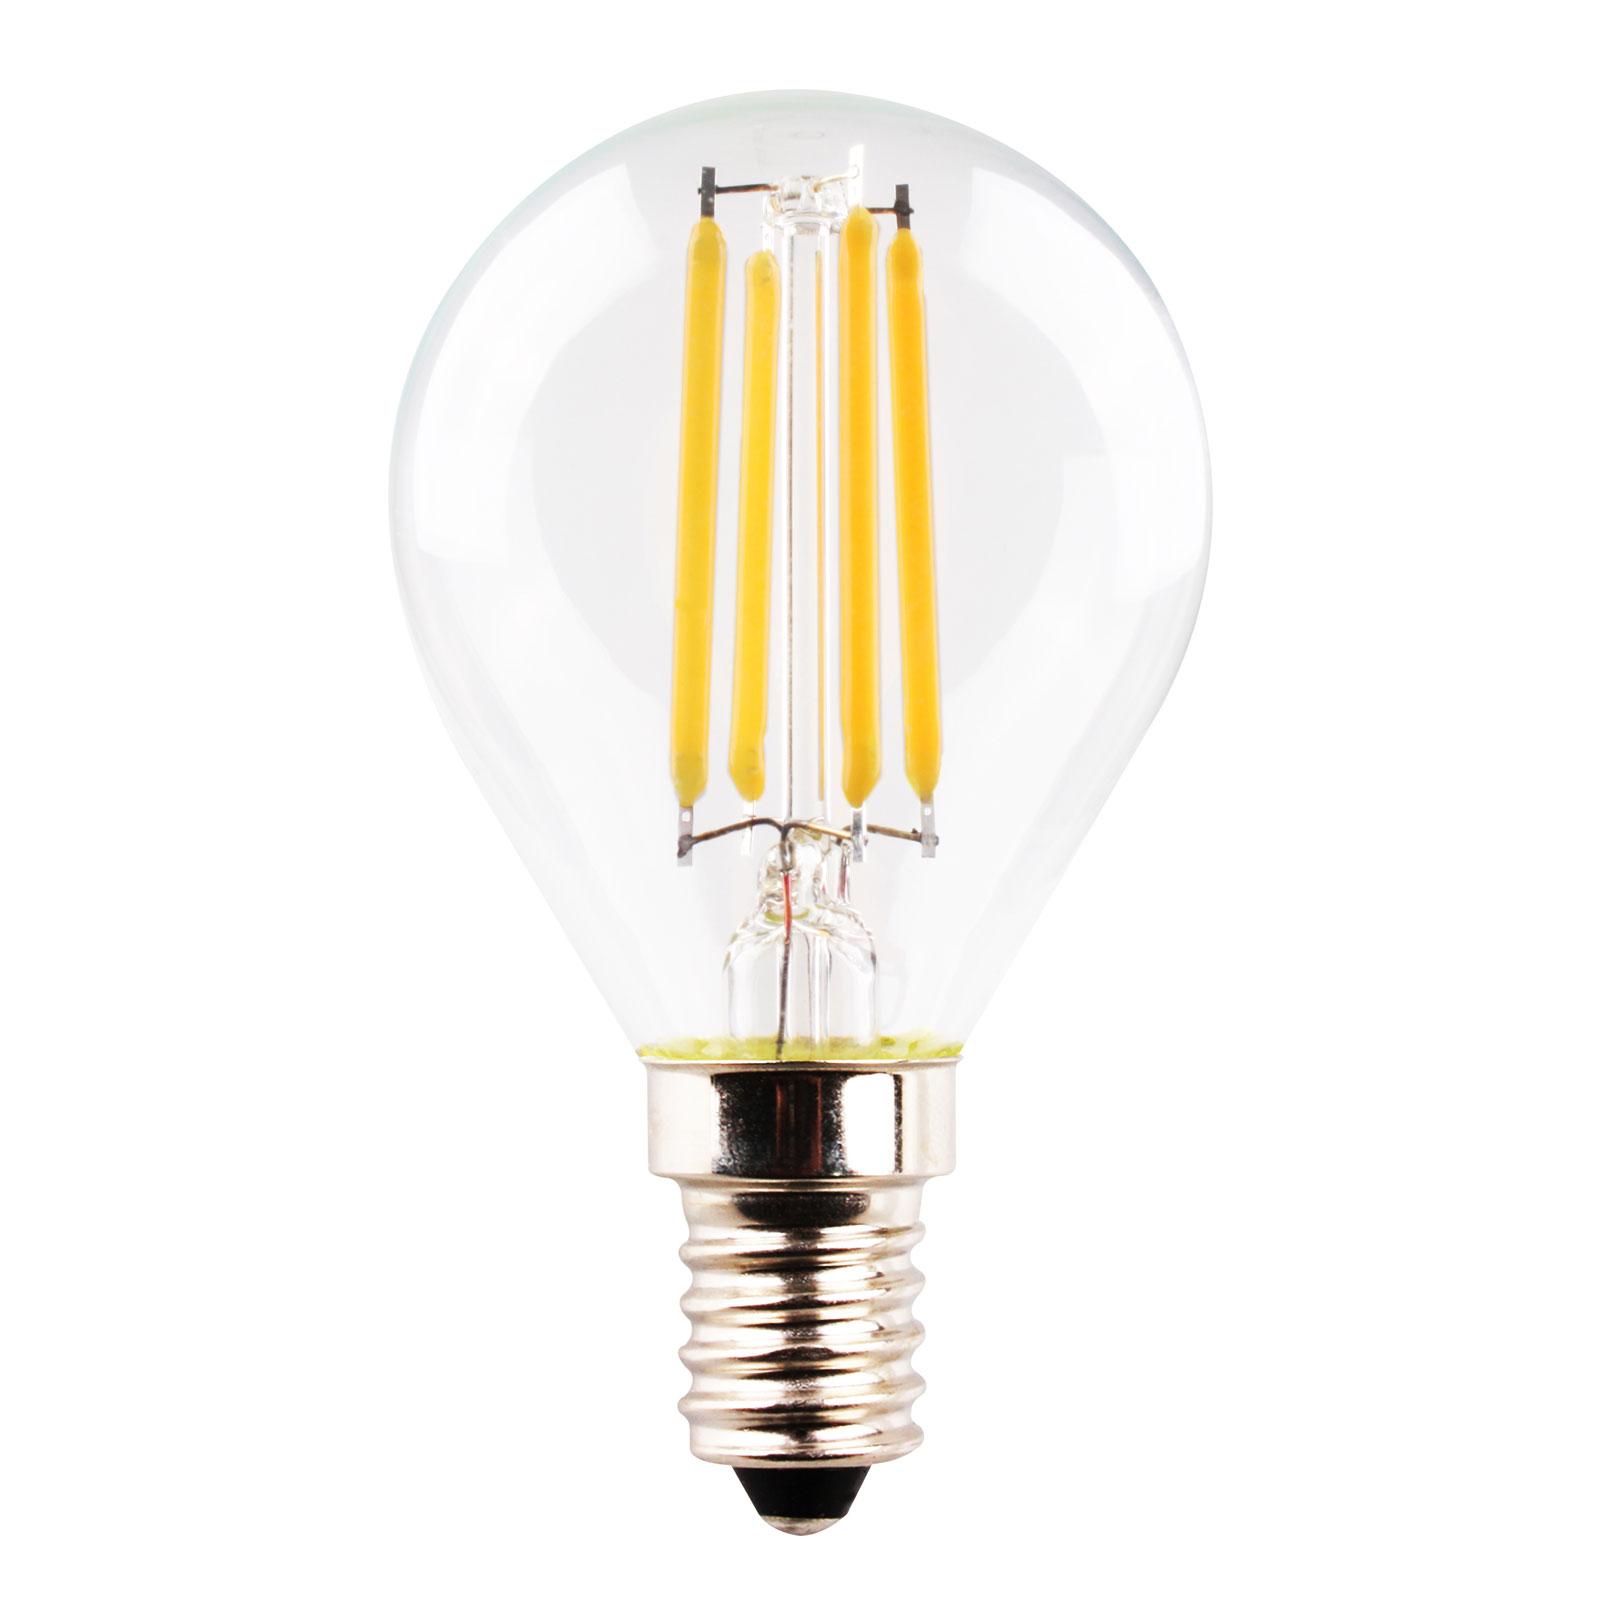 LED-Tropfenlampe E14 4,5W 2.700 K Filament klar